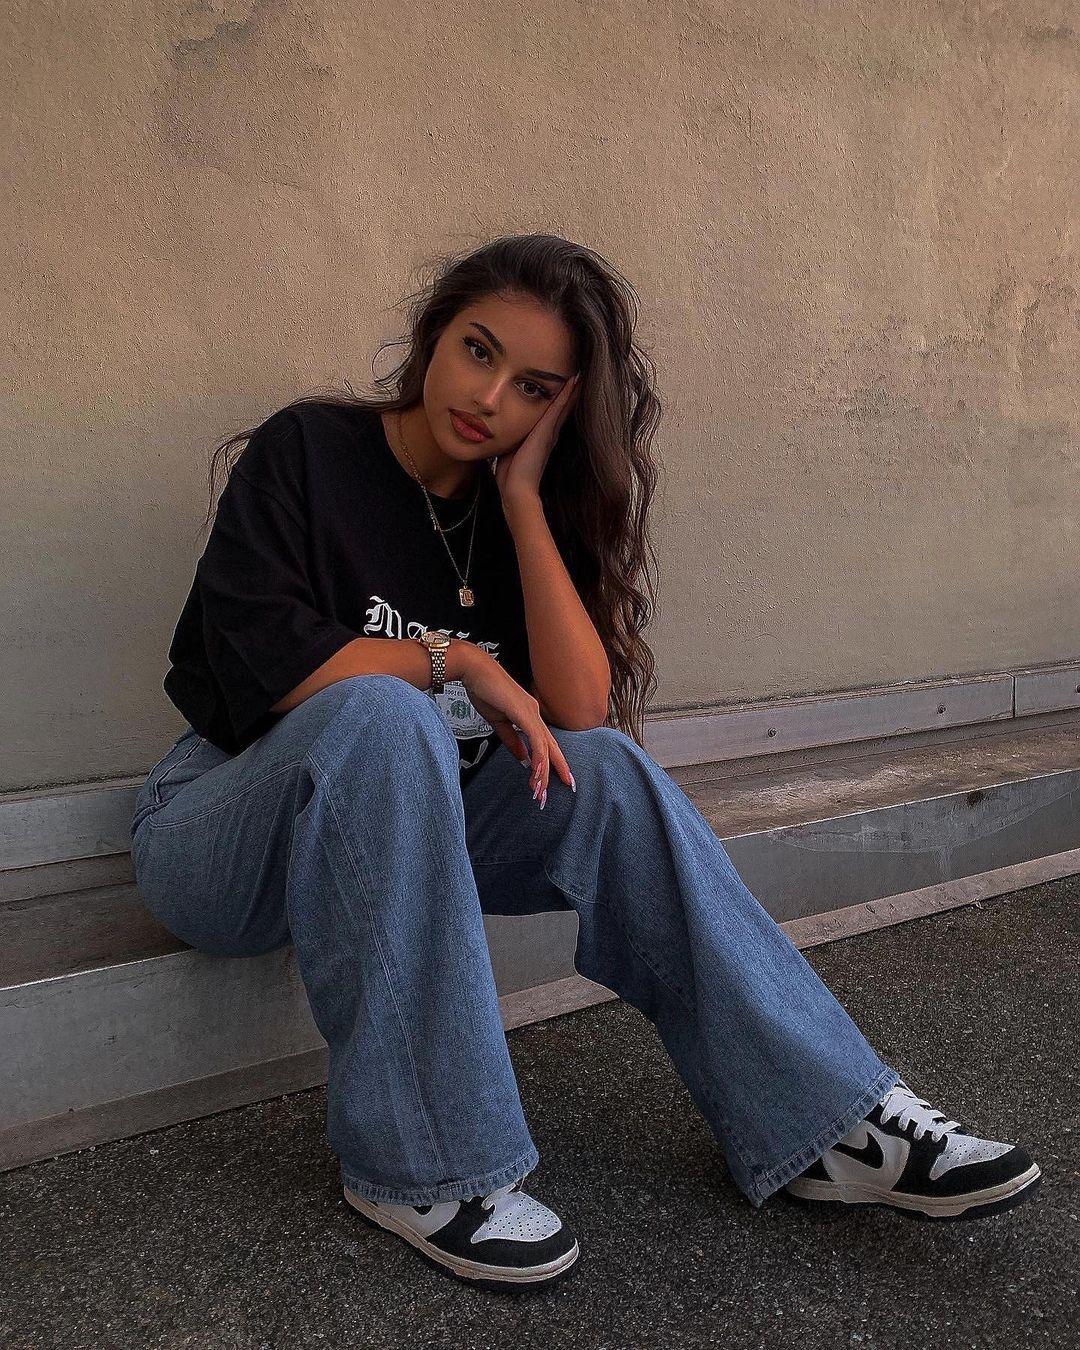 Leyla-Melina-Wallpapers-Insta-Fit-Bio-33